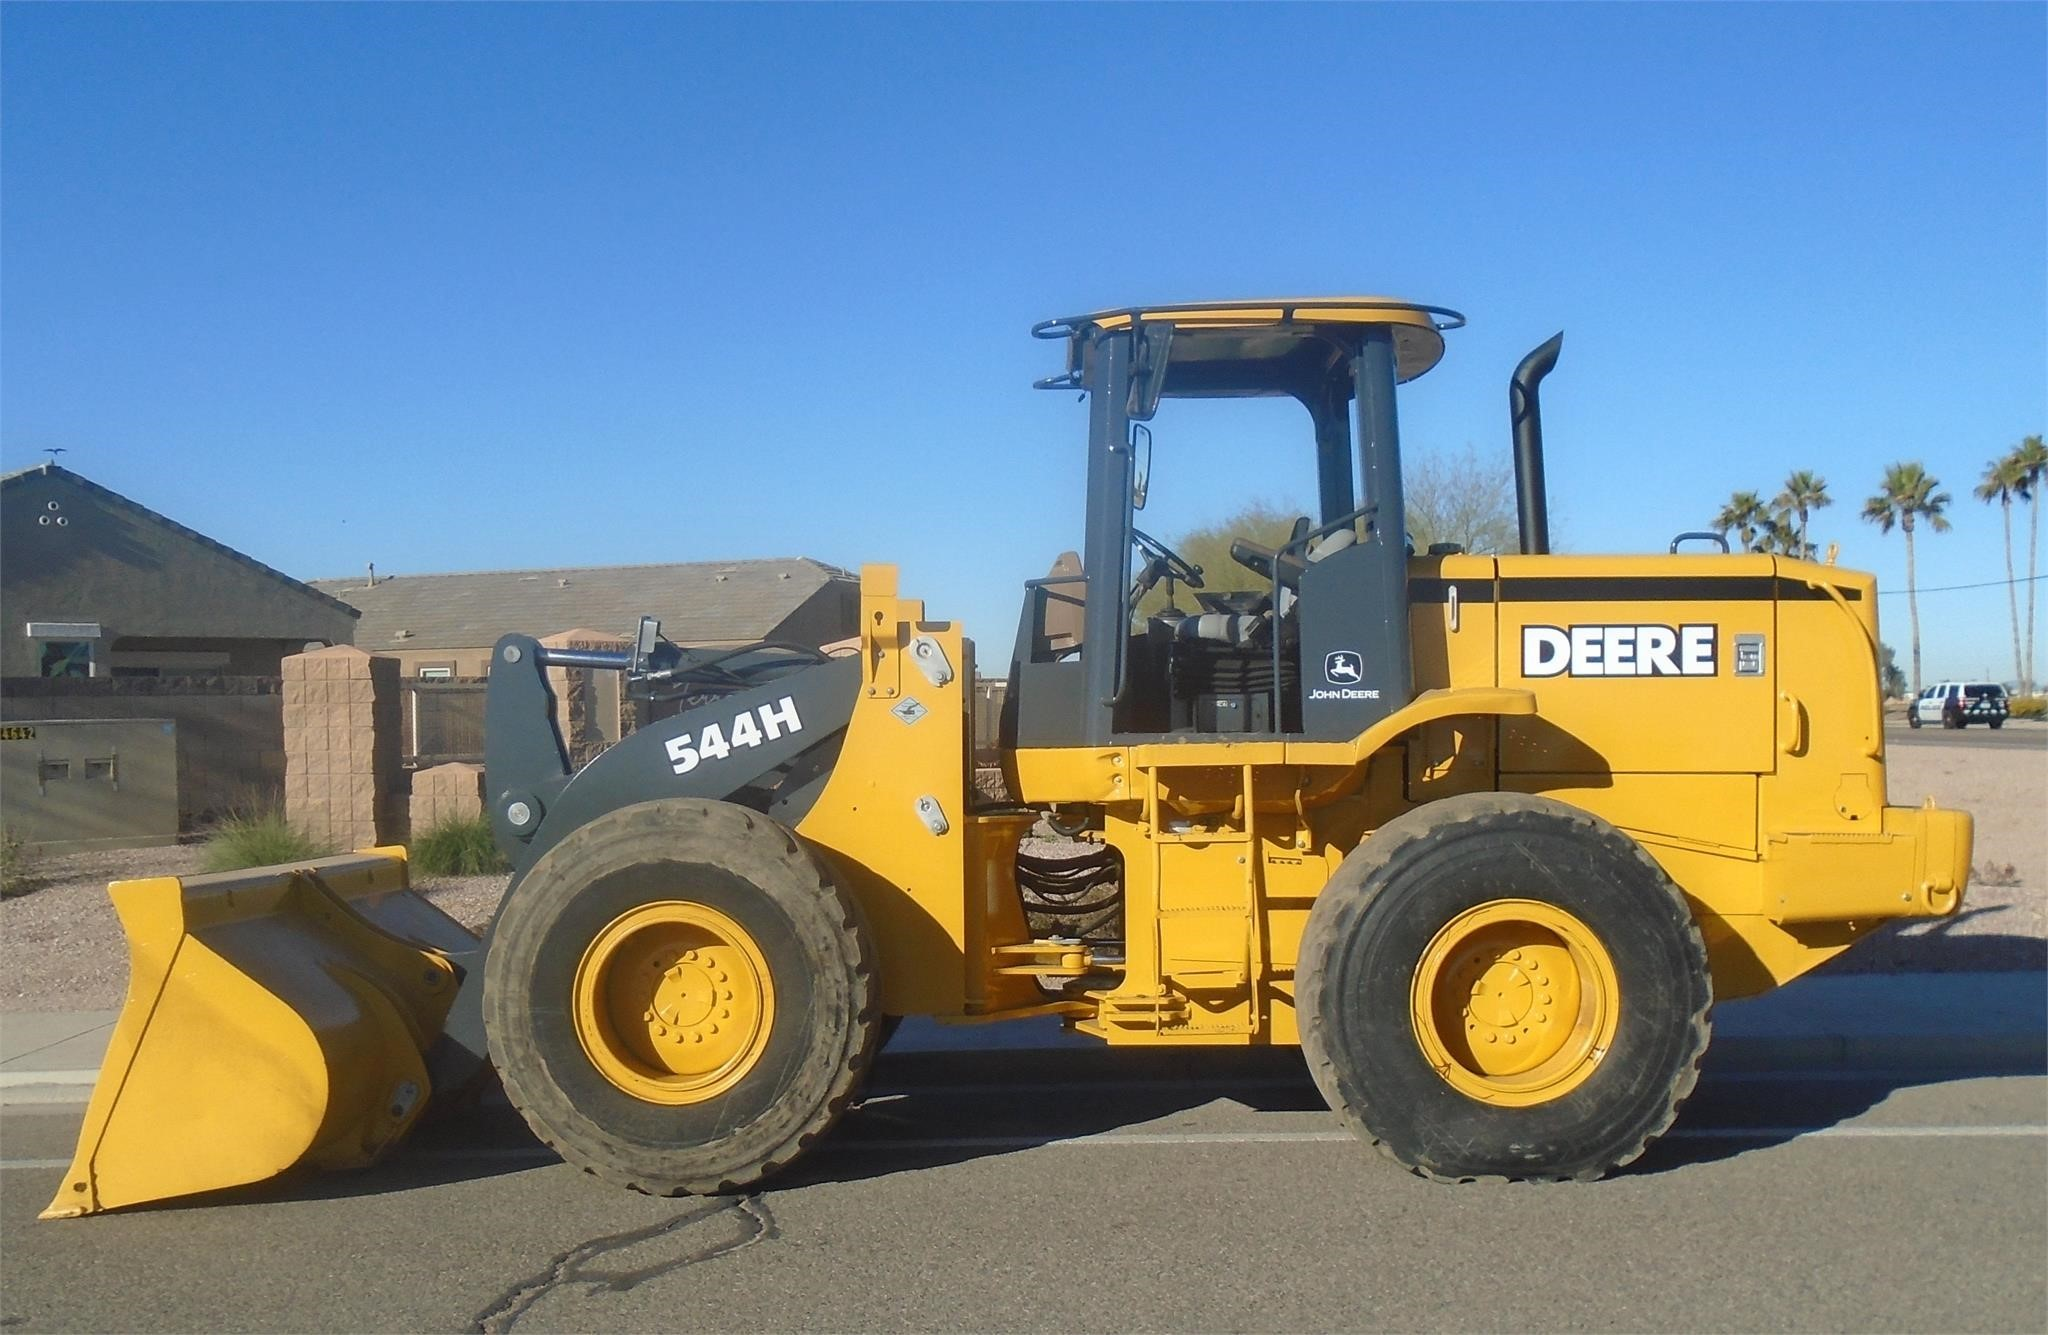 1999 Deere 544H Wheel Loader